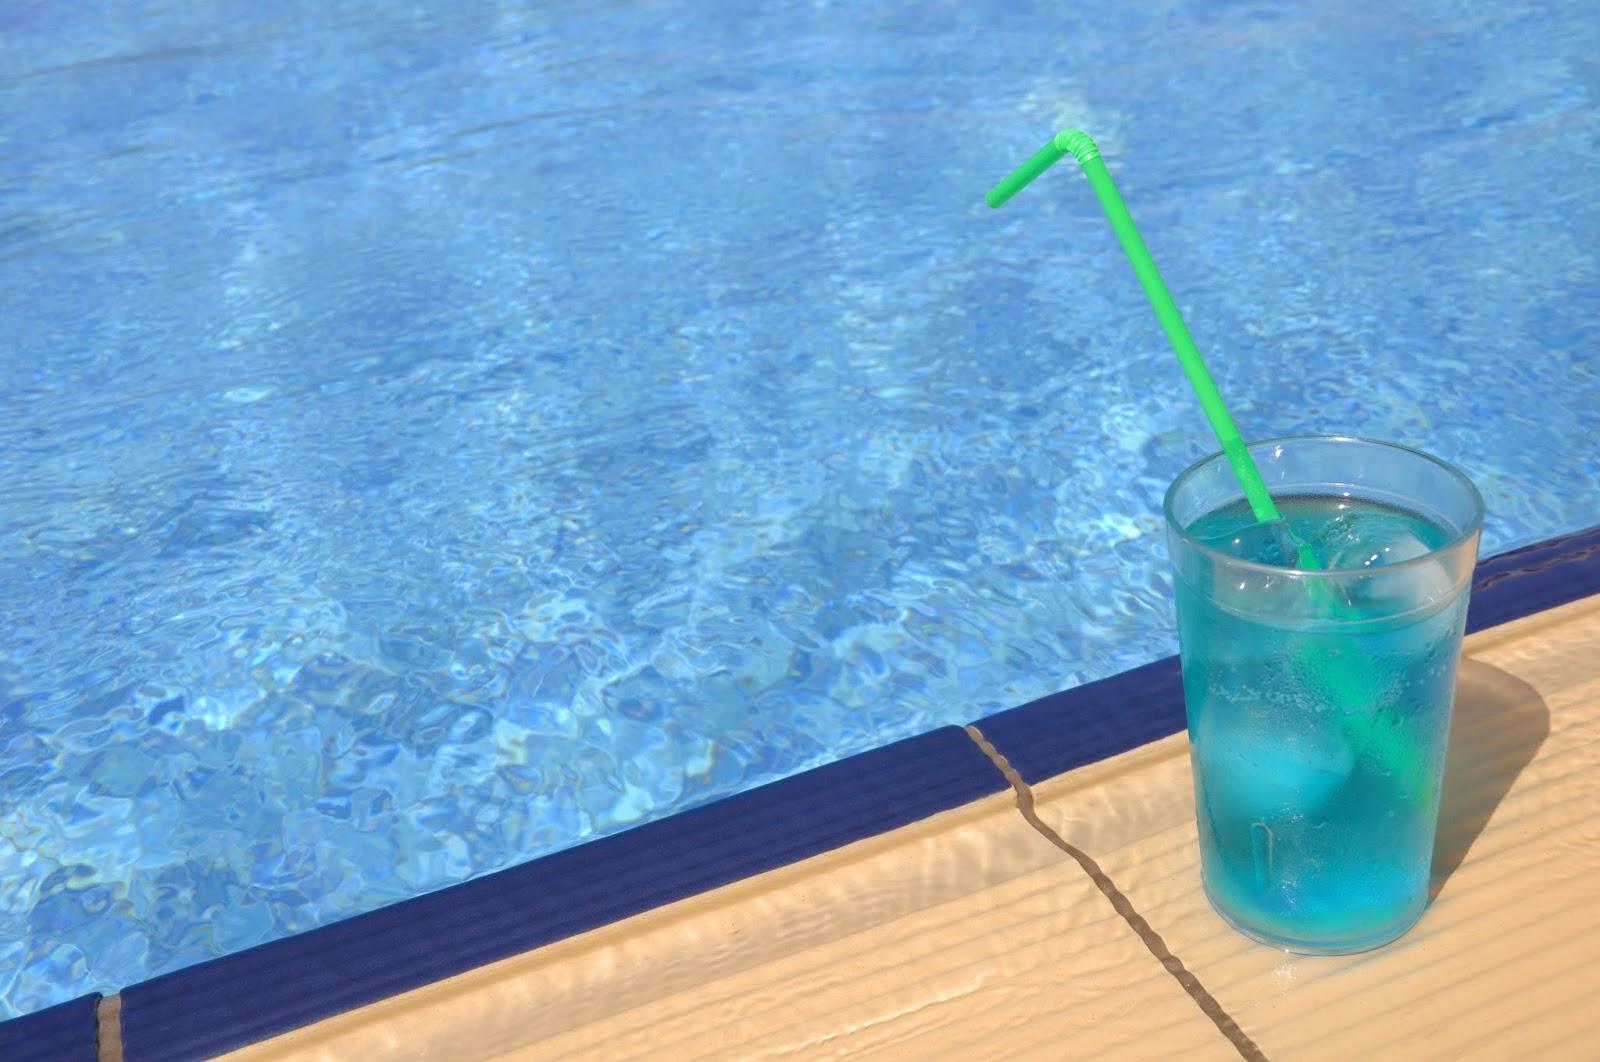 Buytoo.it - Accessori piscina